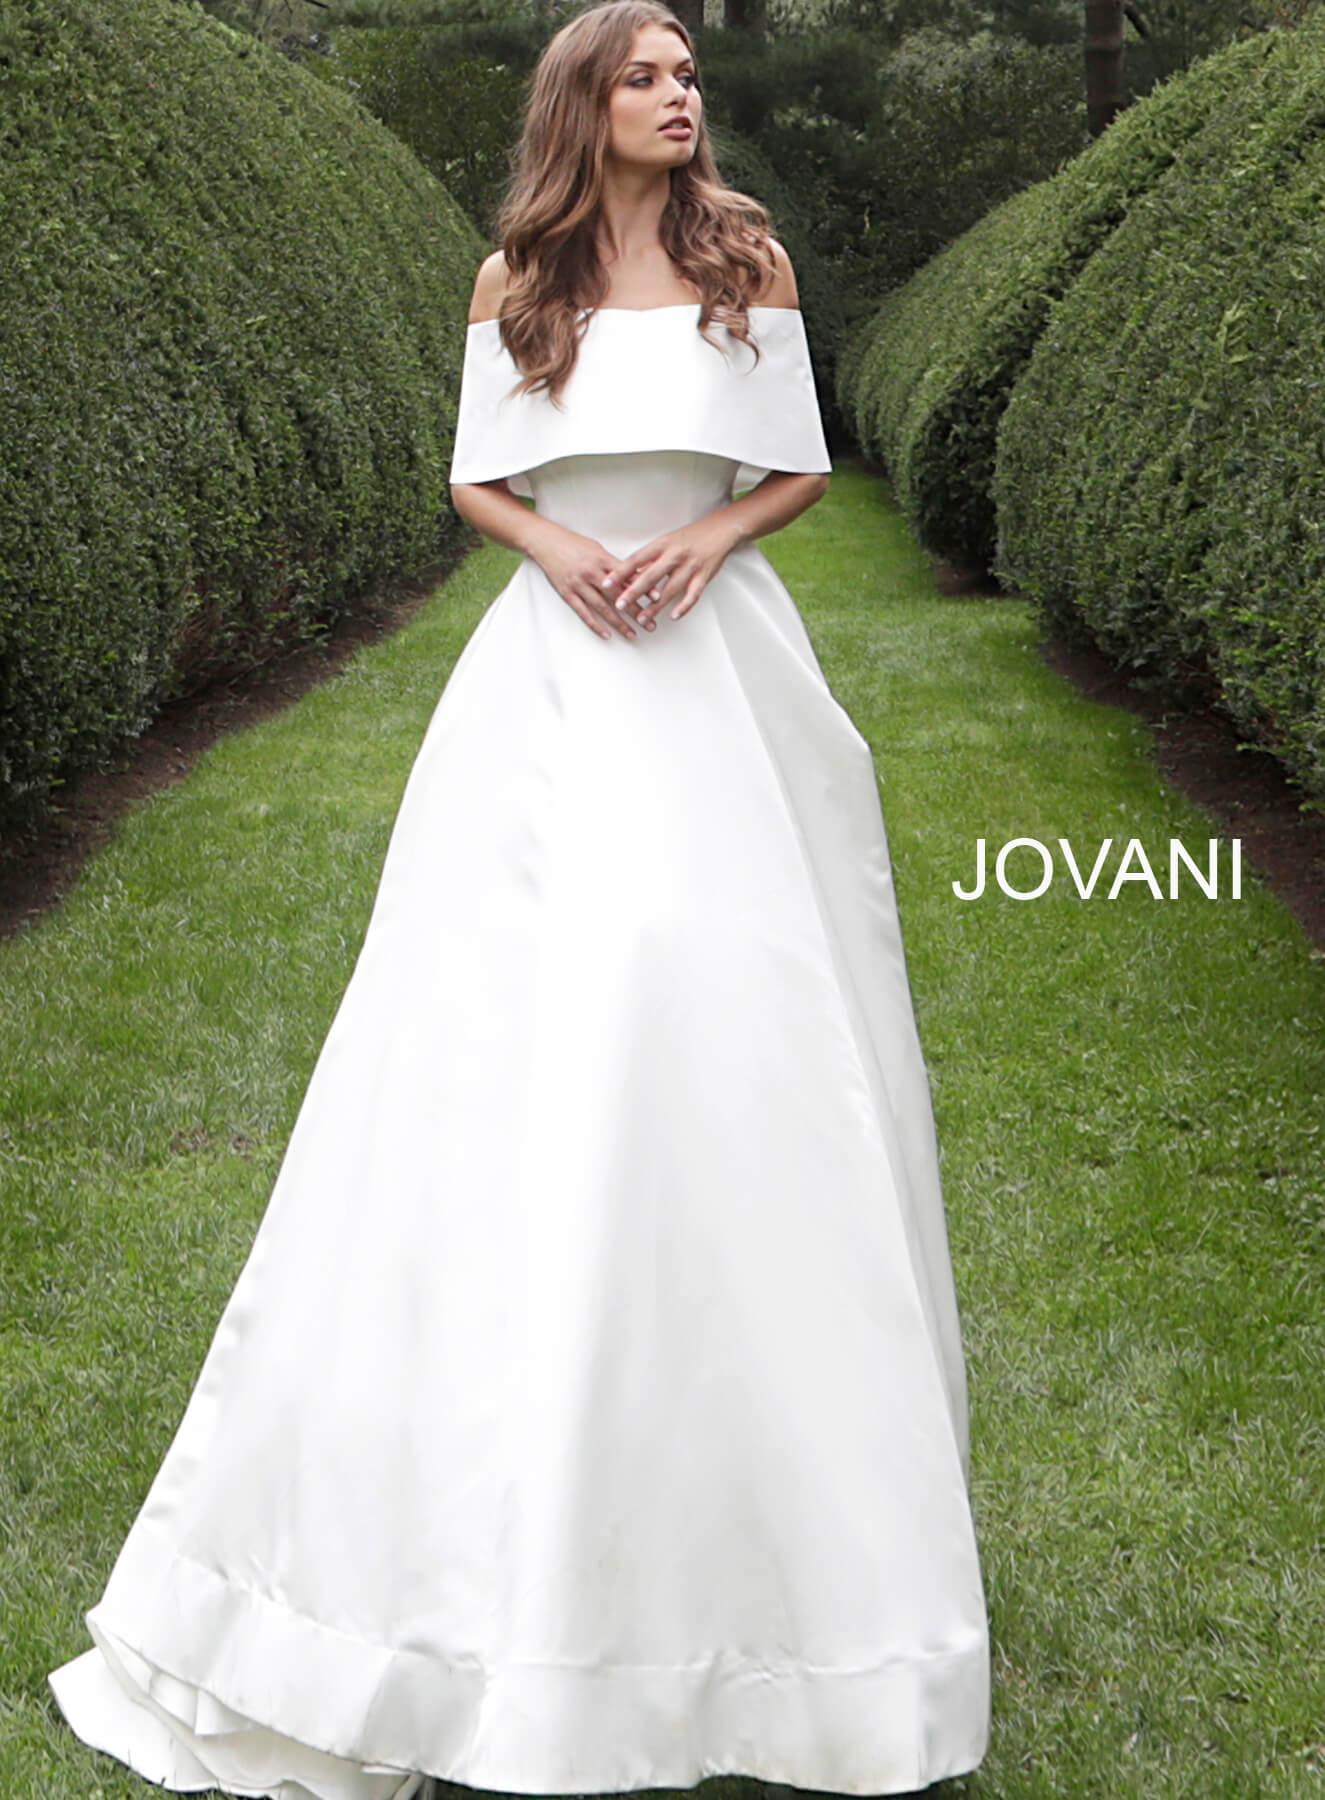 Off Shoulder Wedding Dress.Off White Off The Shoulder Silk Wedding Gown S68287